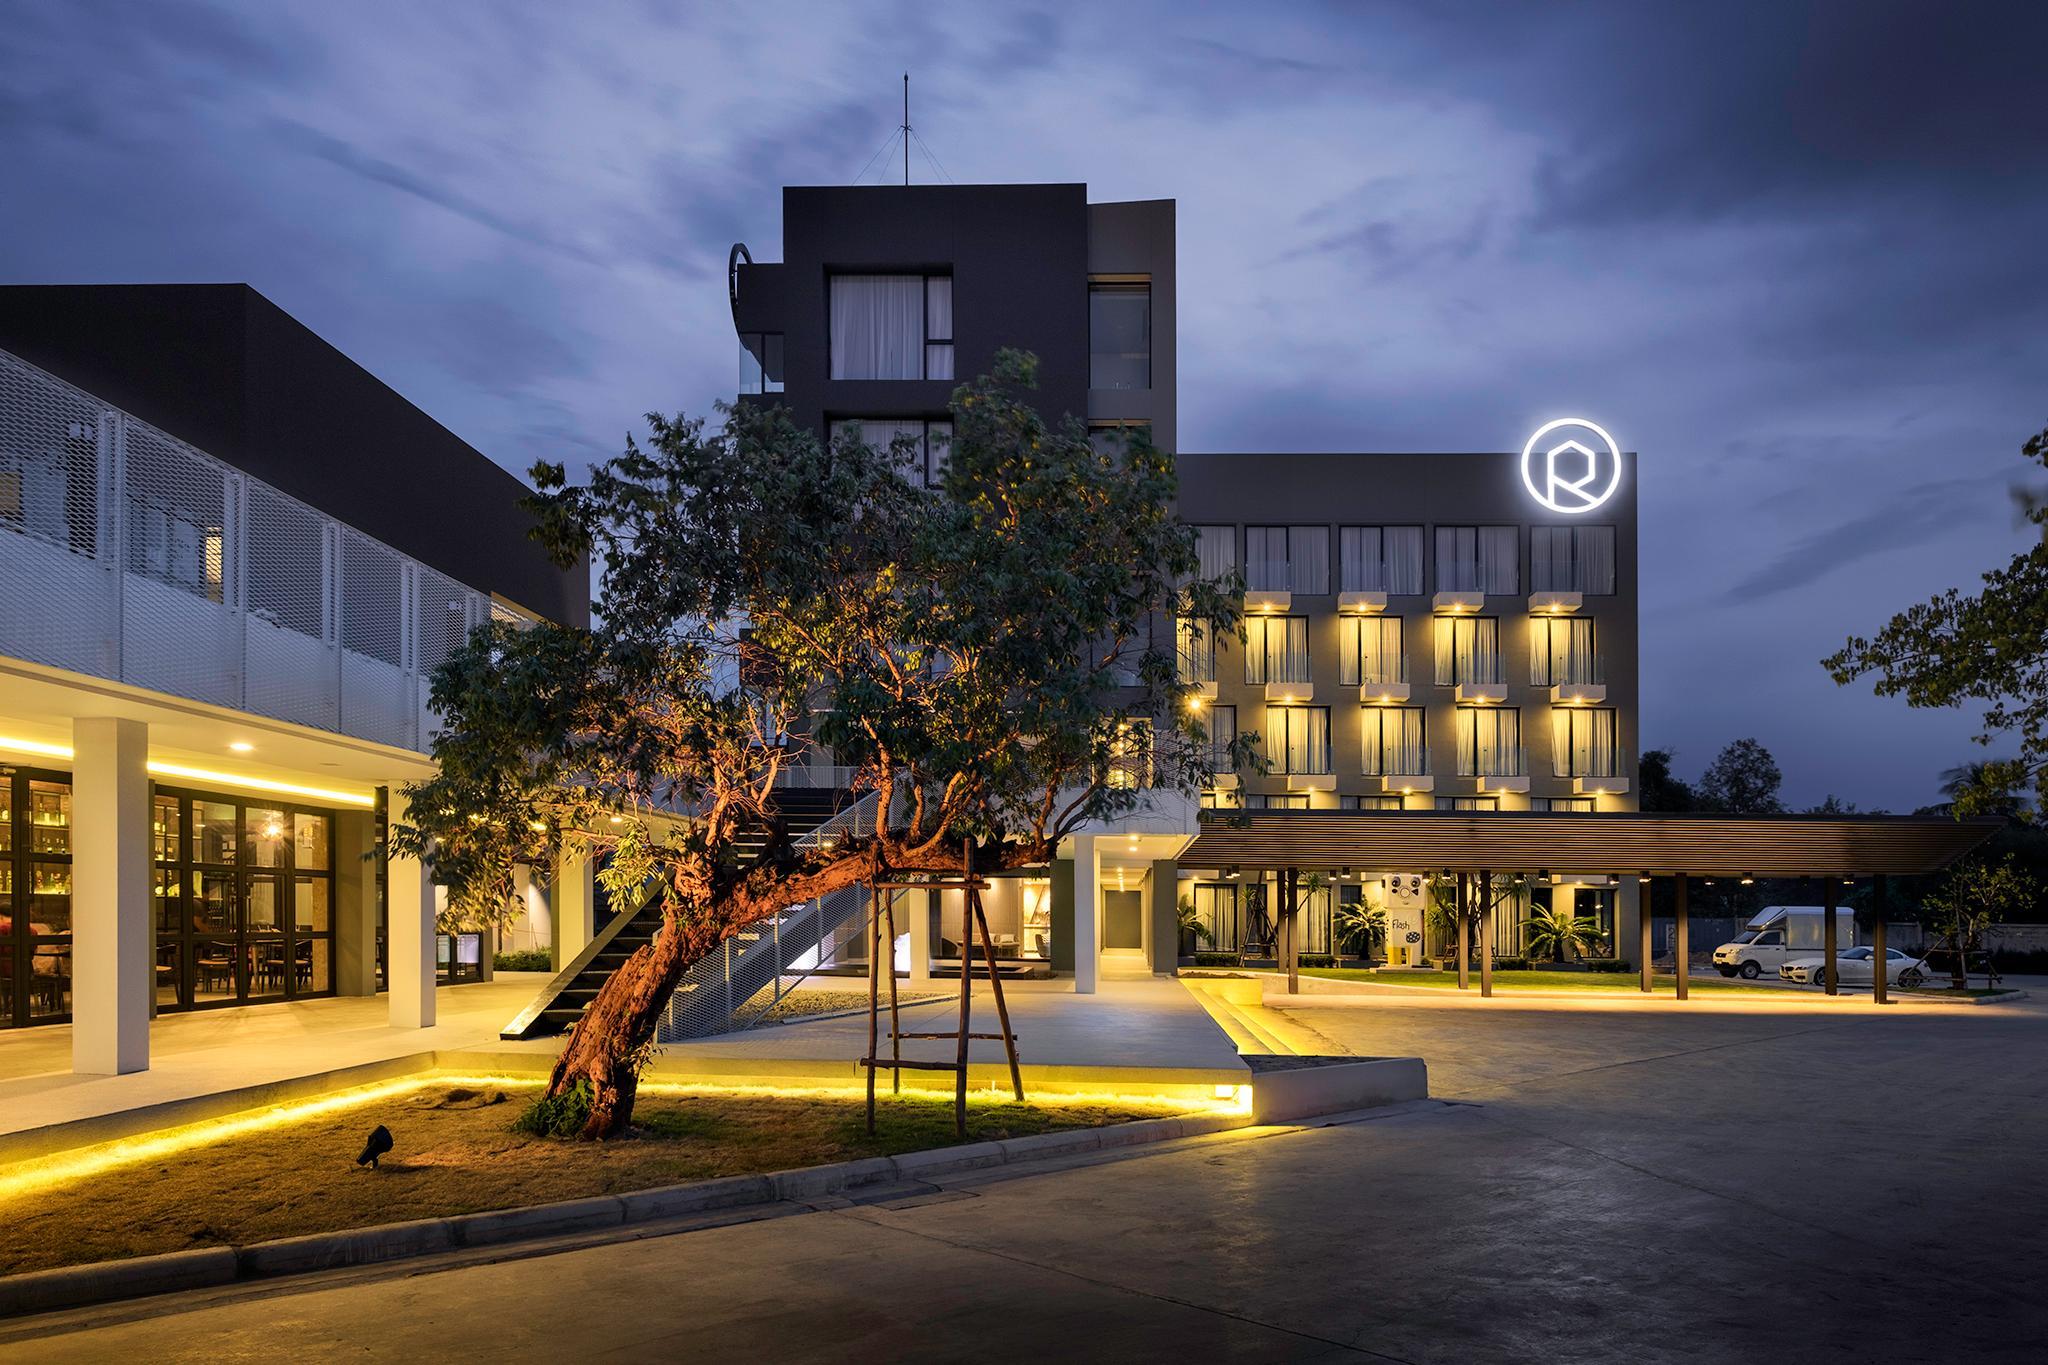 R Photo Hotel,R Photo Hotel